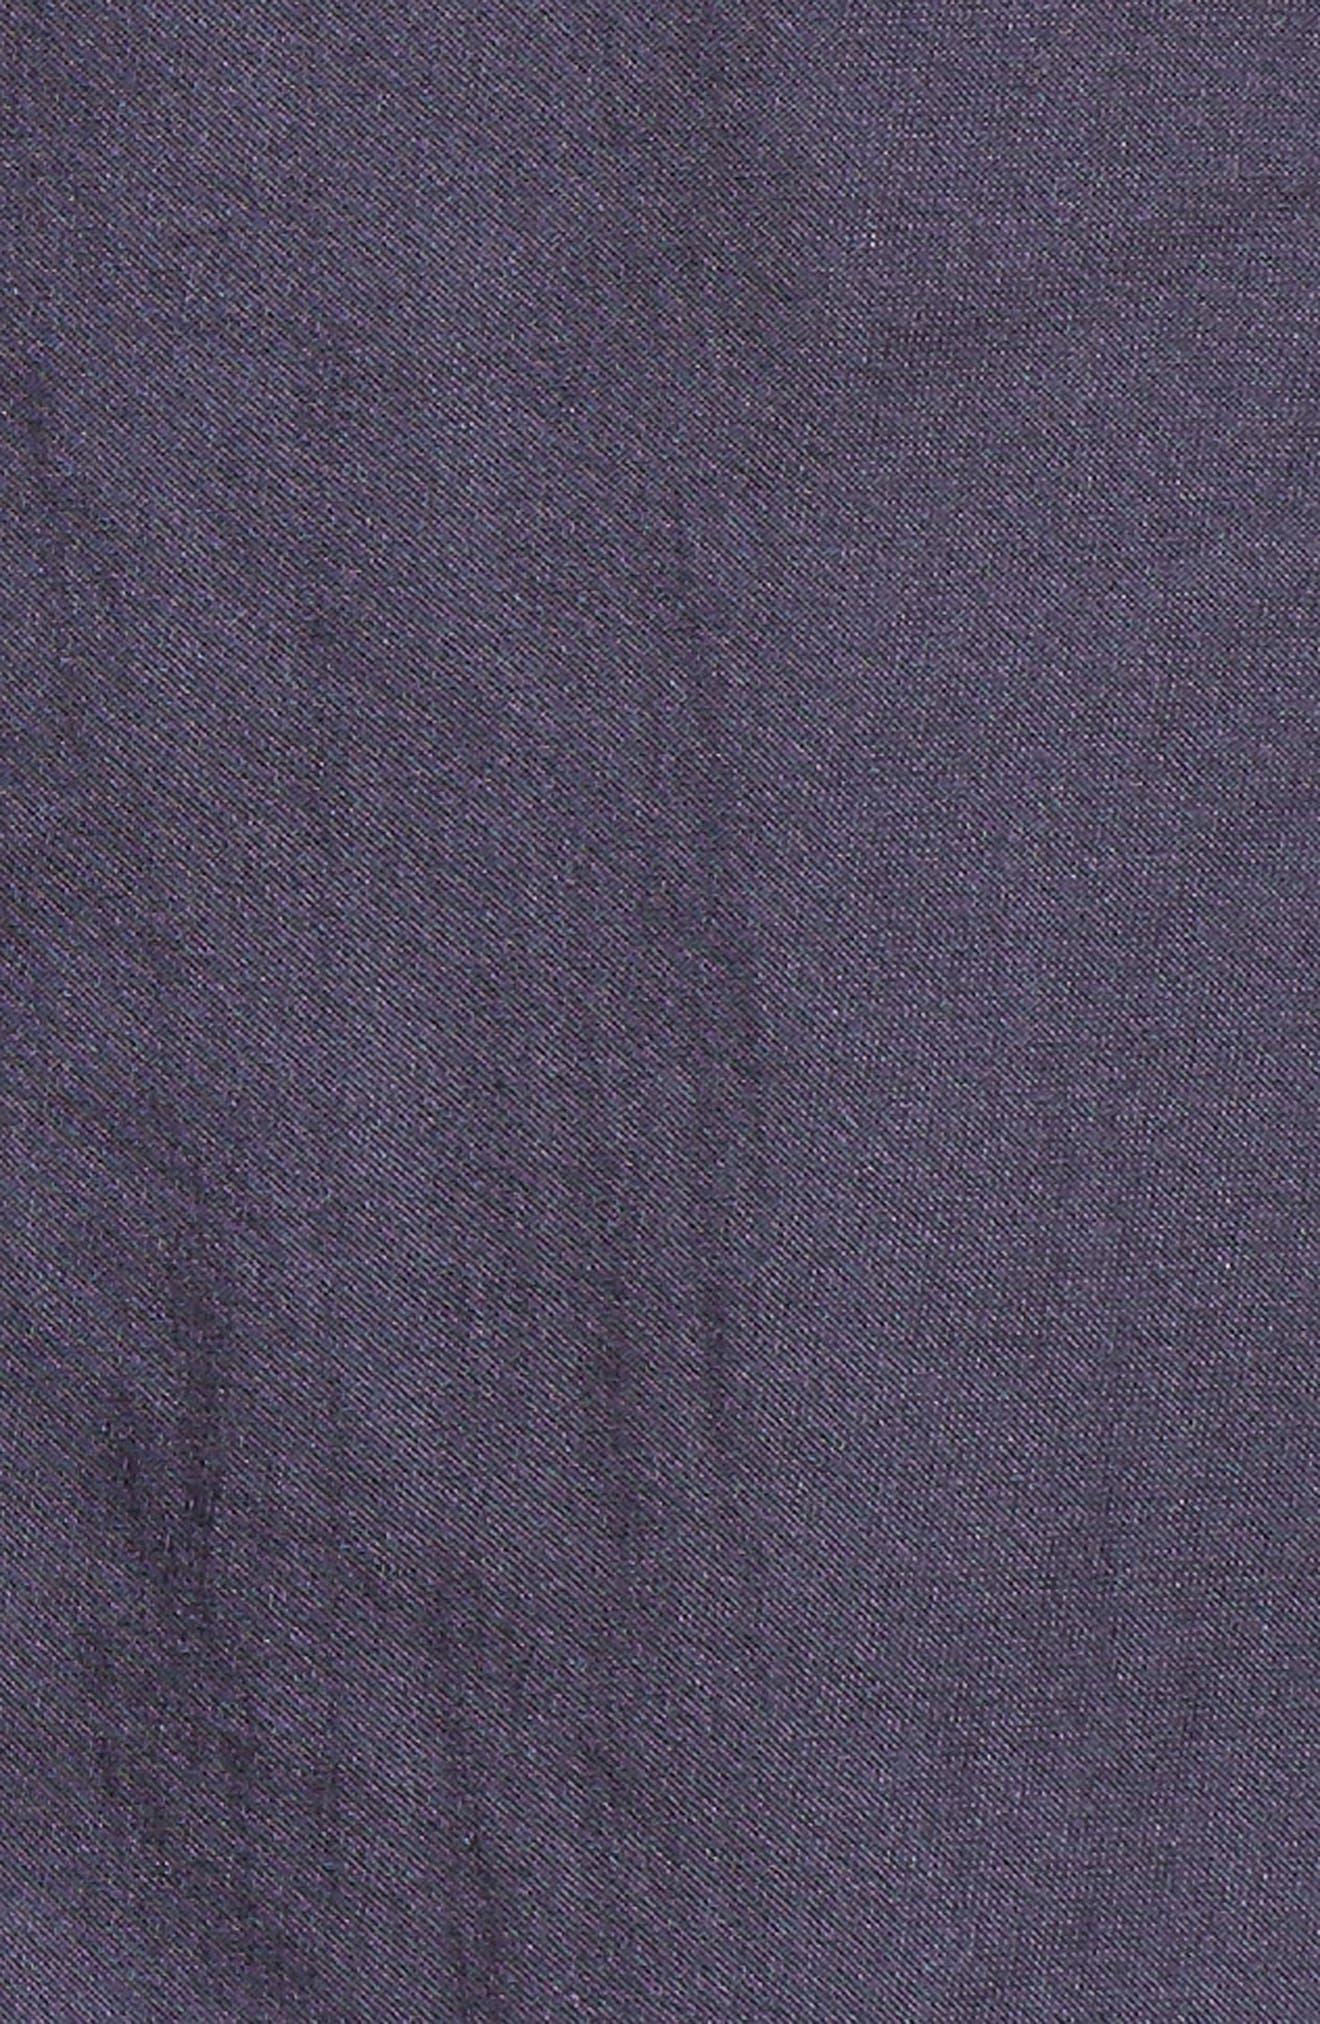 Destination Midi Dress,                             Alternate thumbnail 6, color,                             481